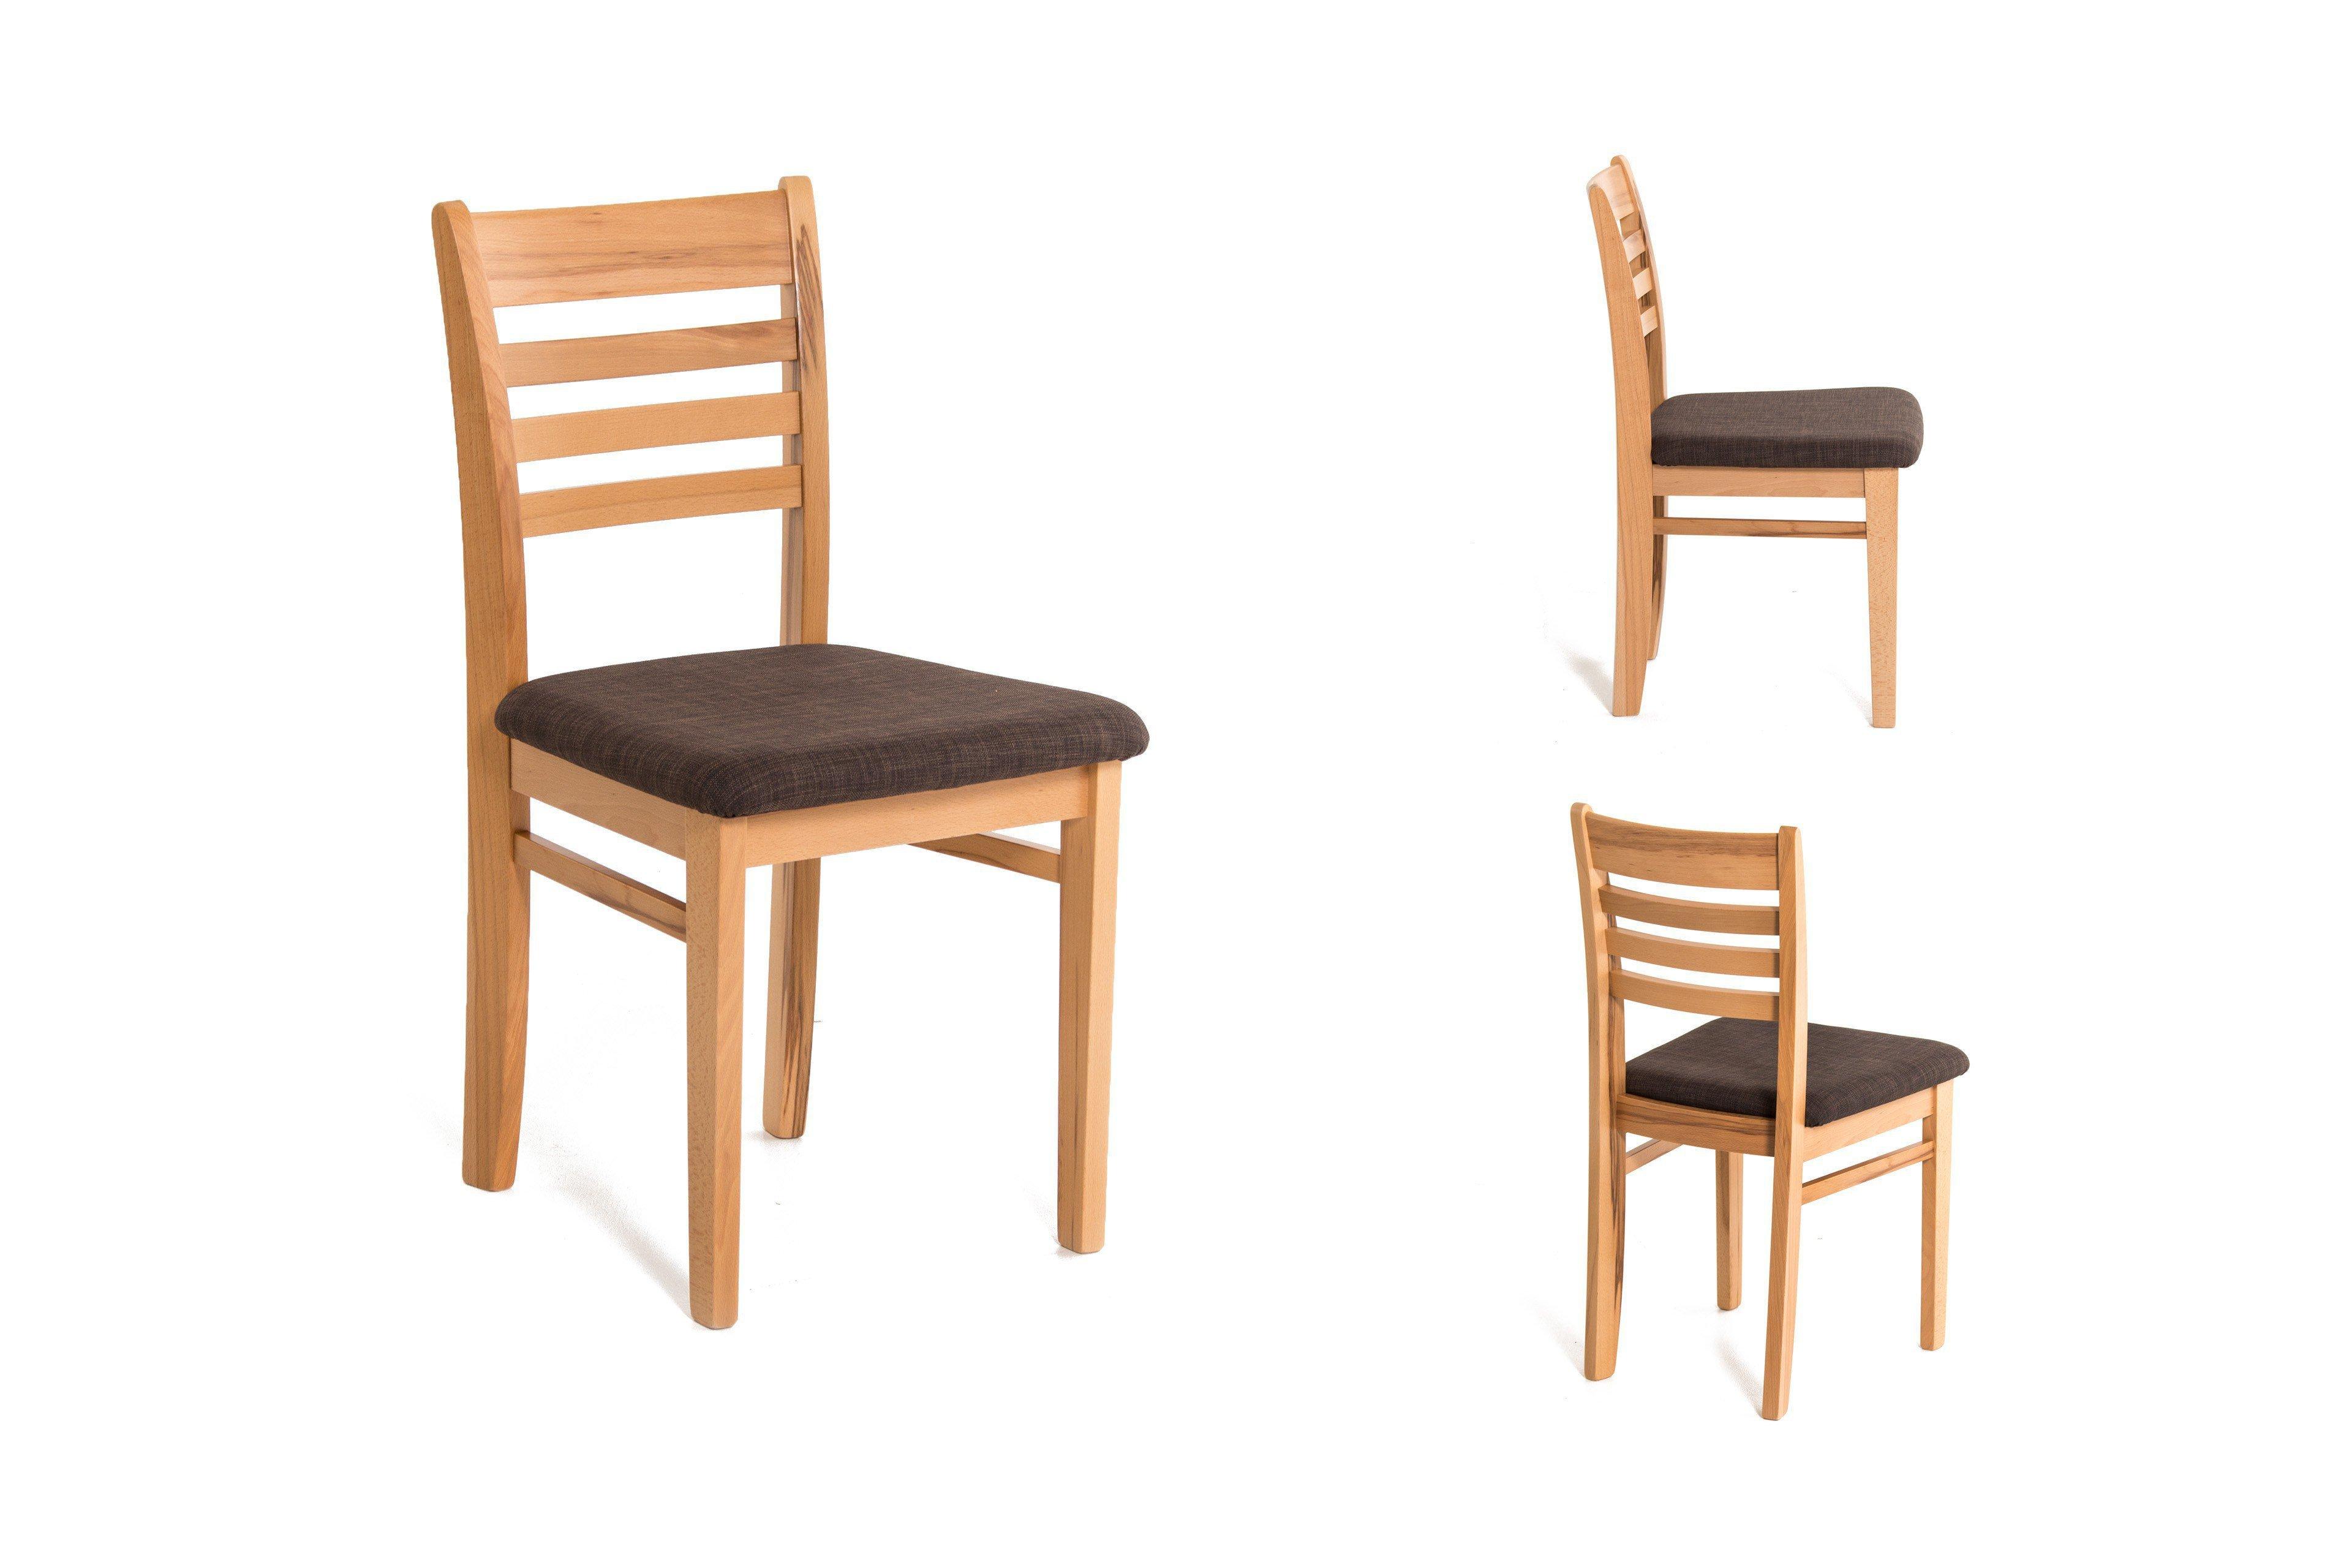 elro eckbankgruppe borkum kernbuche m bel letz ihr. Black Bedroom Furniture Sets. Home Design Ideas